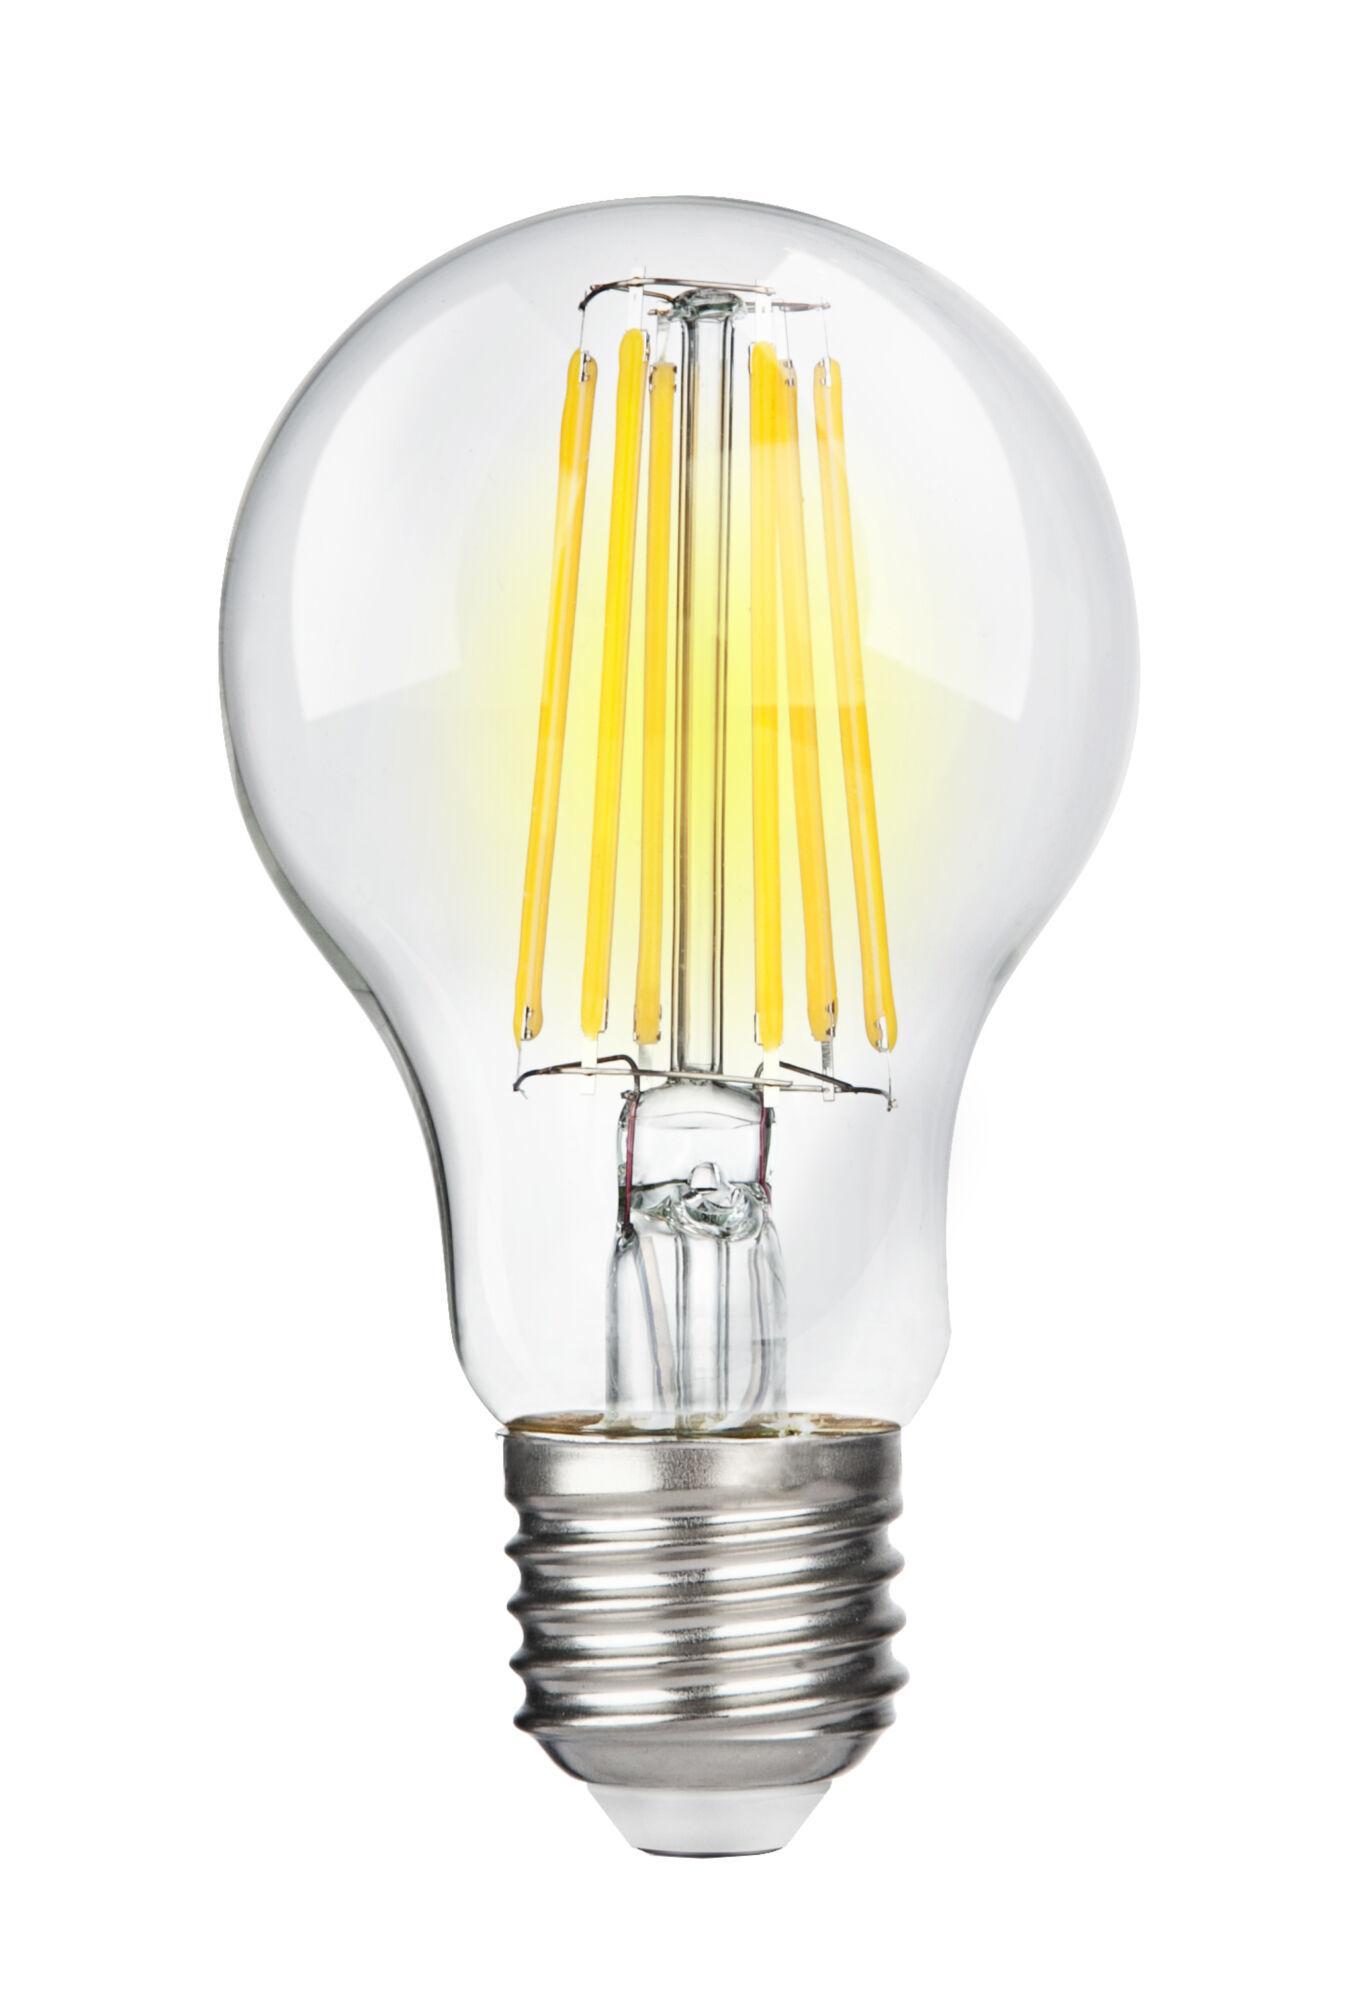 Филаментная светодиодная лампа Voltega Crystal 7101 груша E27 10W, 4000K 220V, гарантия 3 года - фото 1